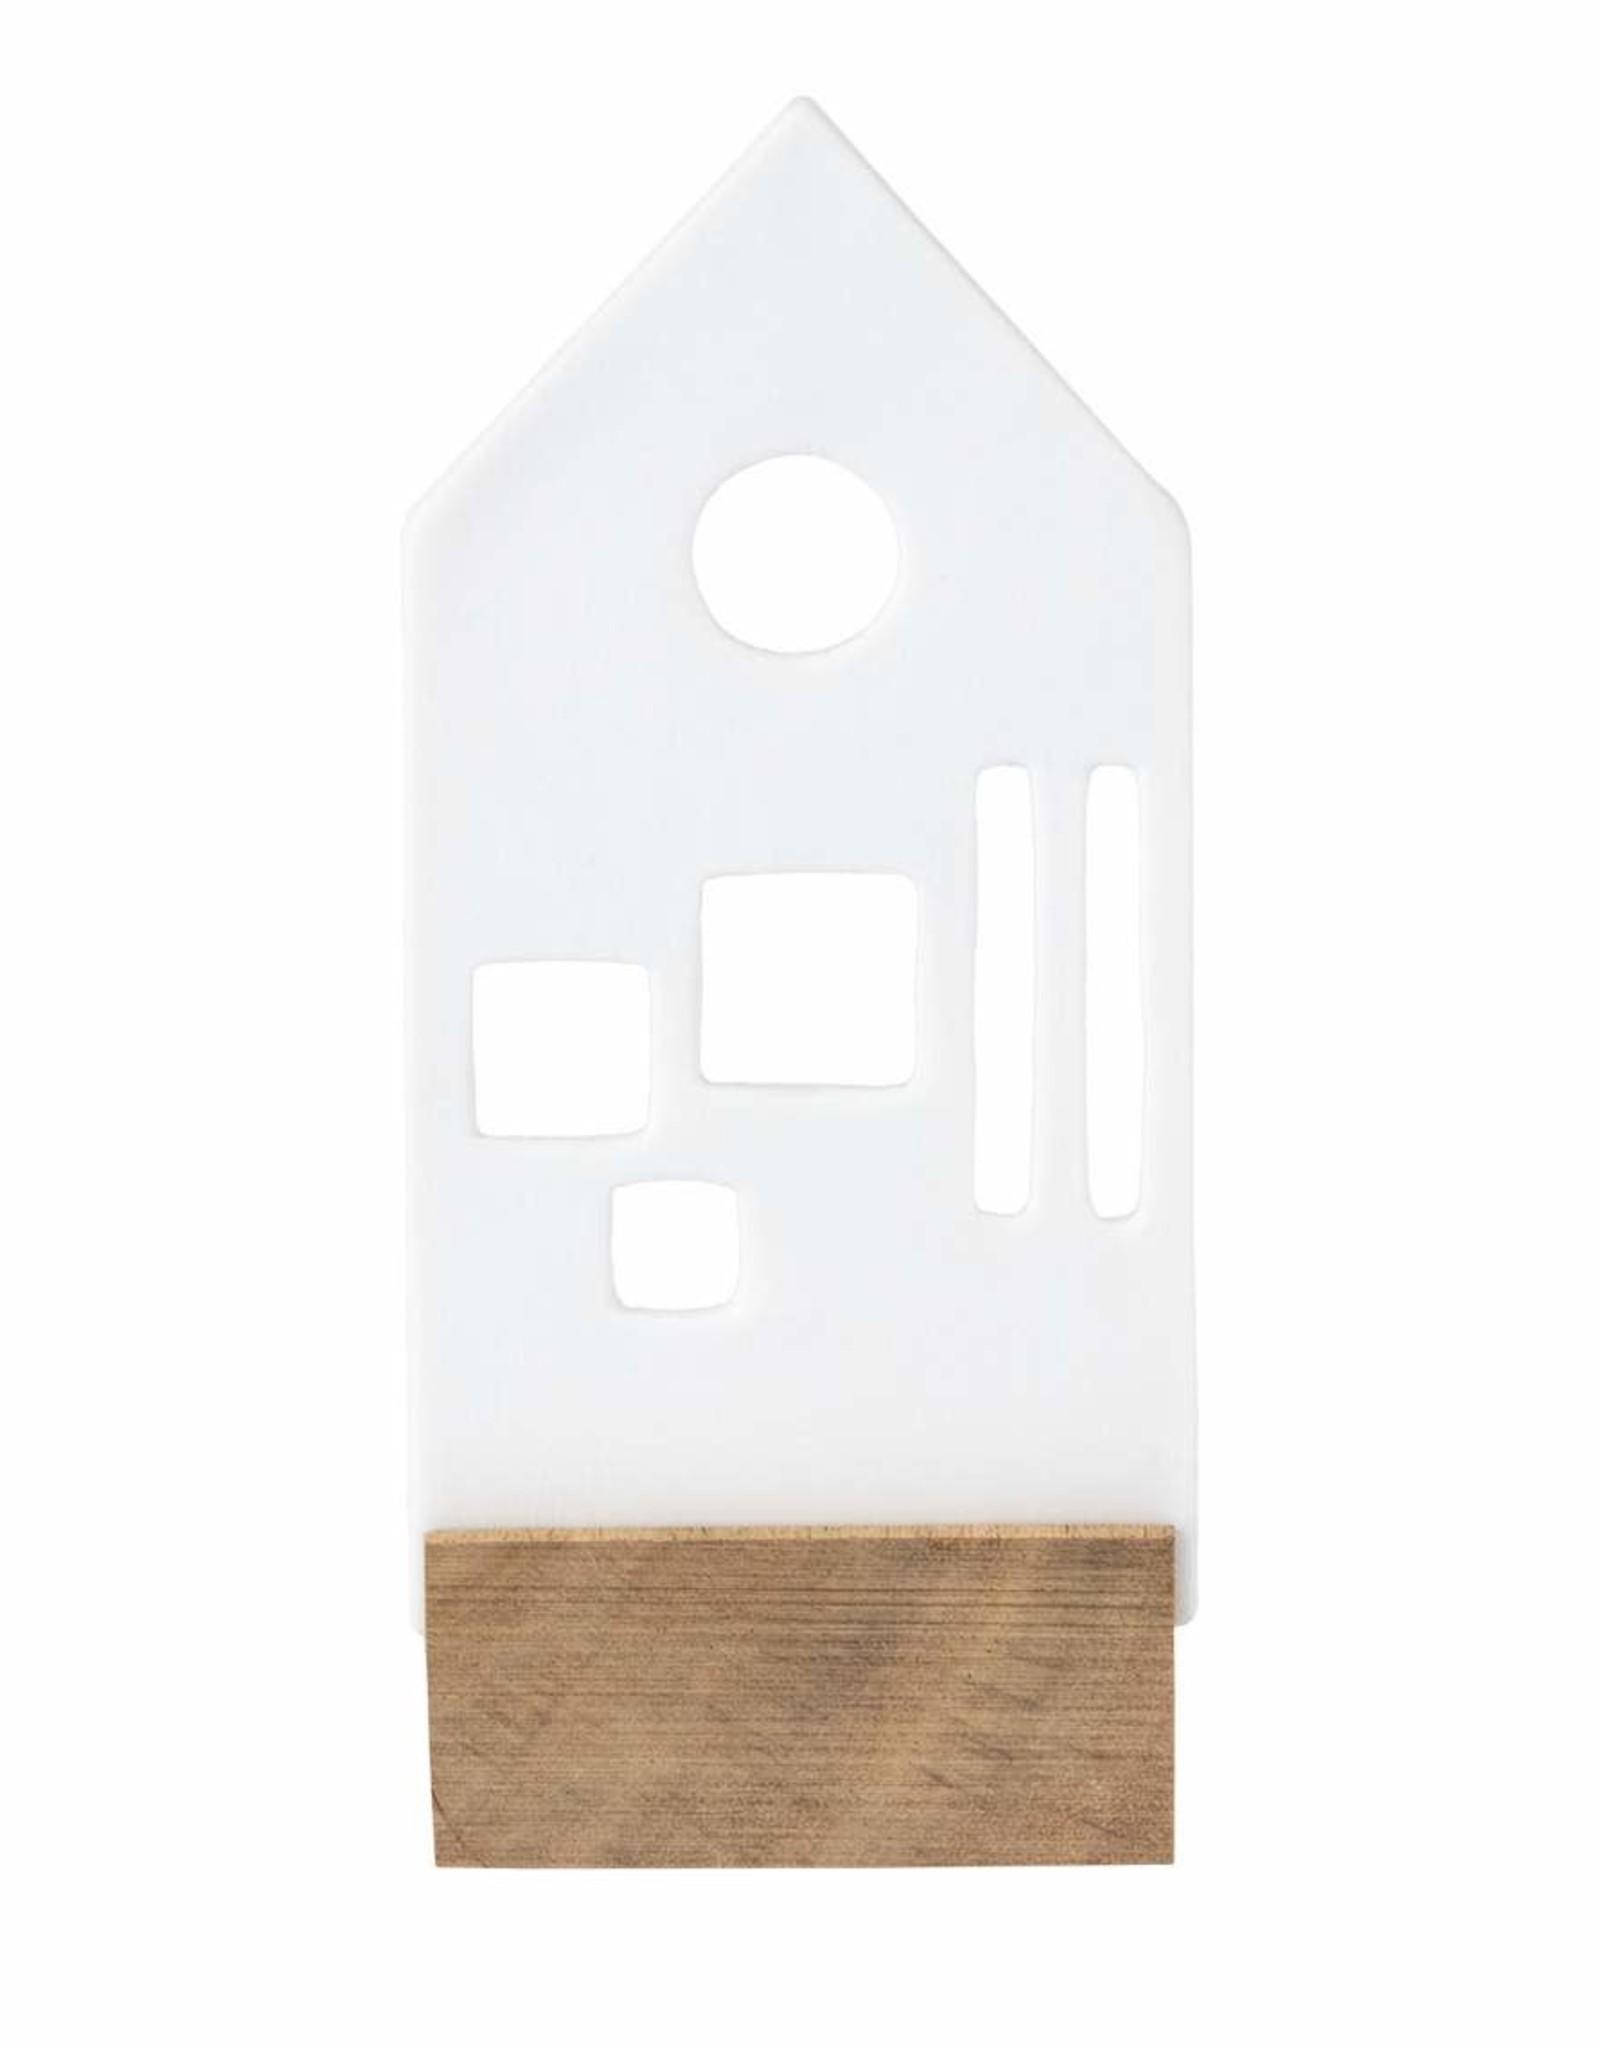 Räder Rader - Light object house